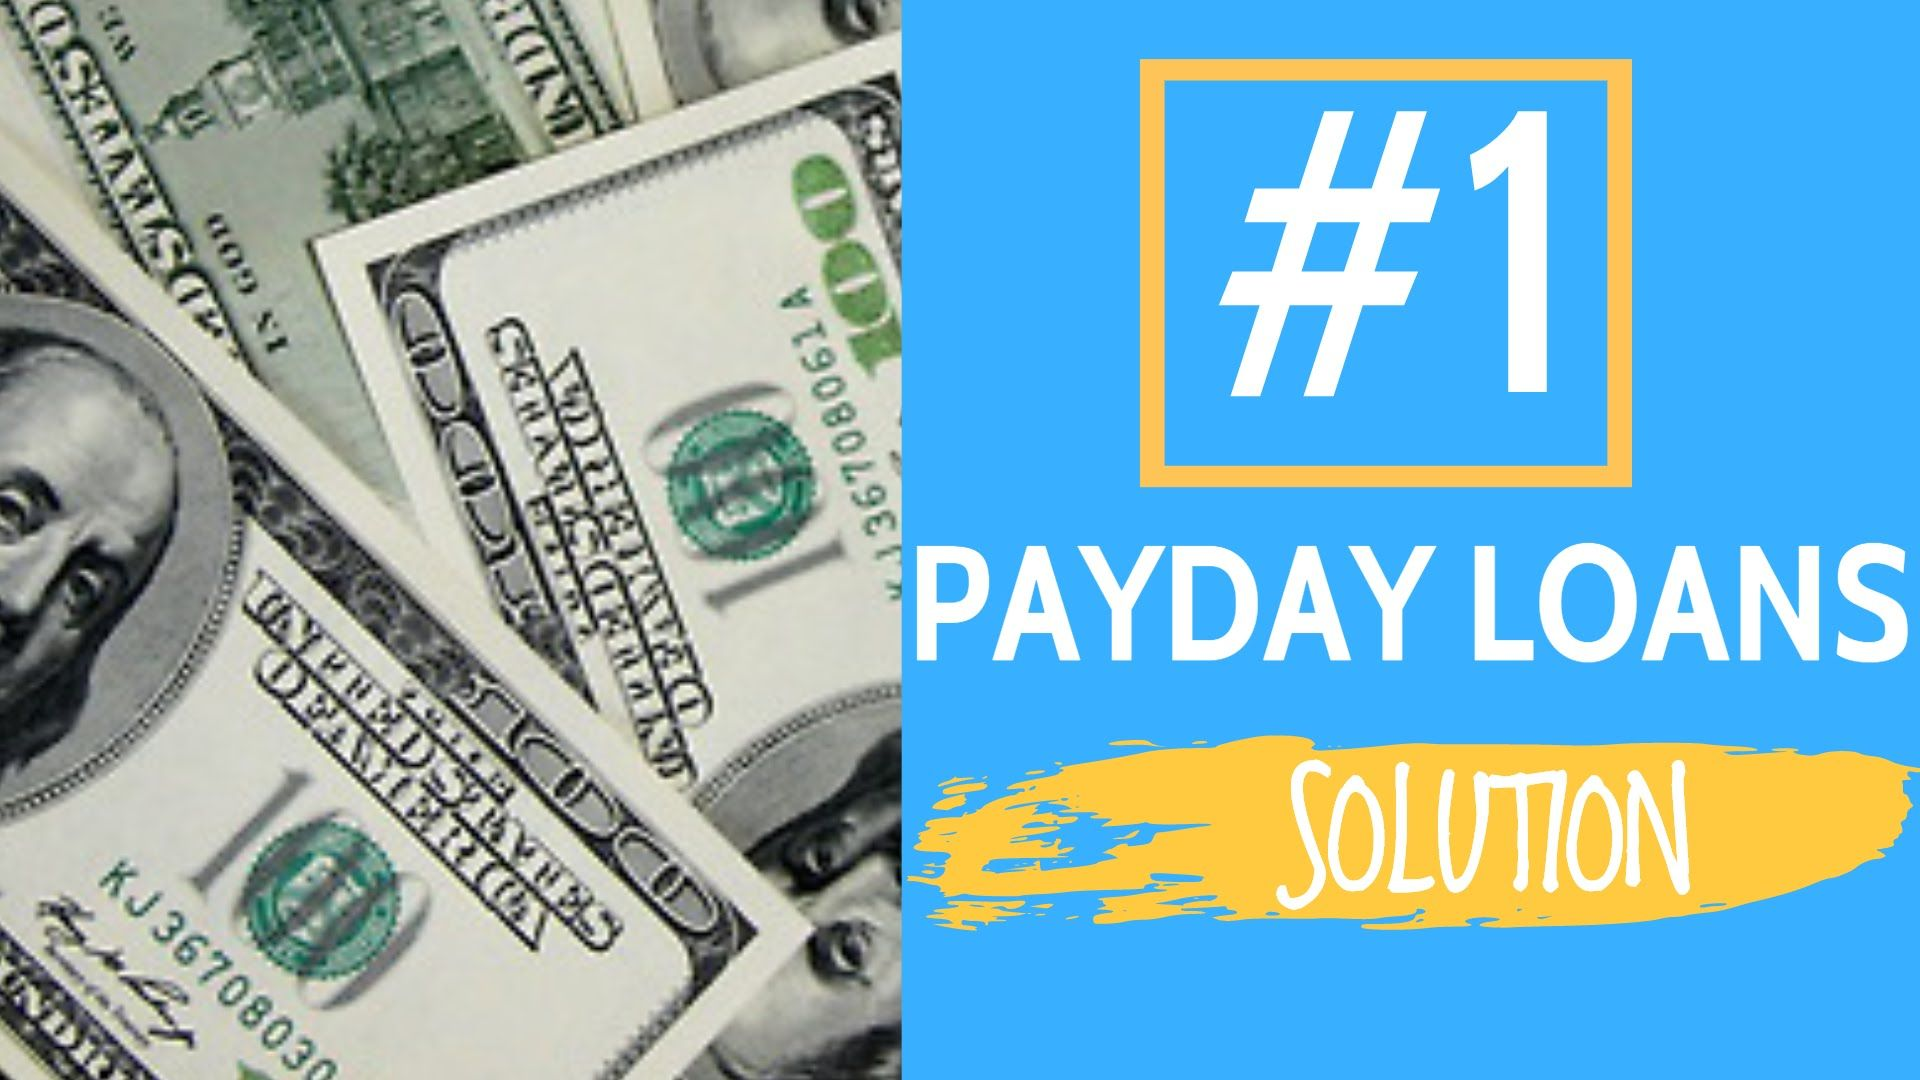 Payday loans through moneygram image 3